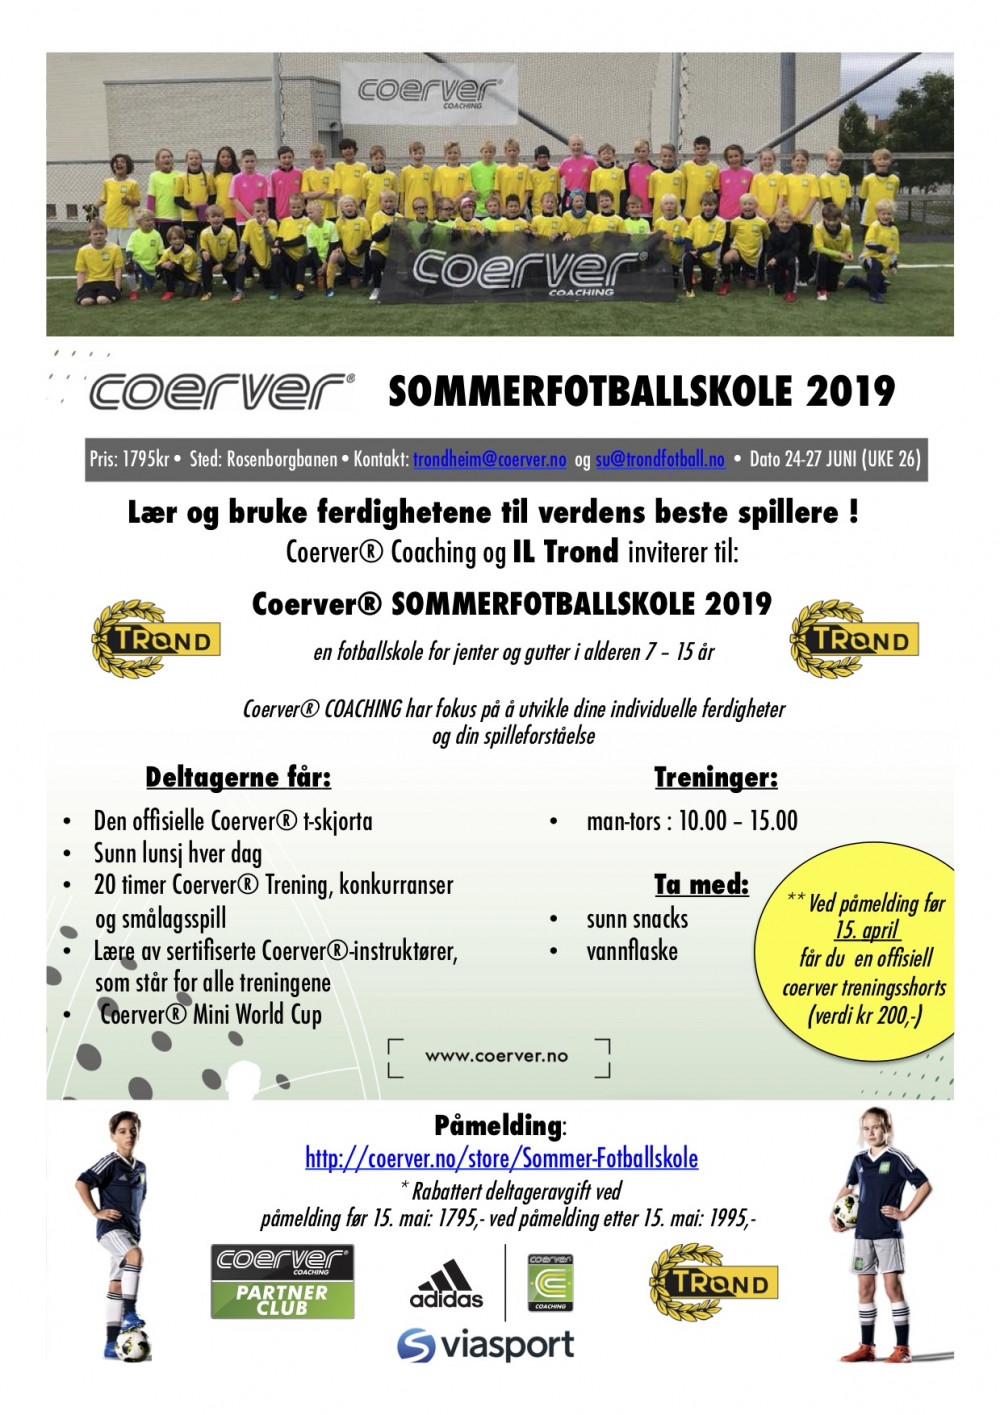 Coerver Sommerfotballskole hos IL Trond (UKE 26)  2006-2012